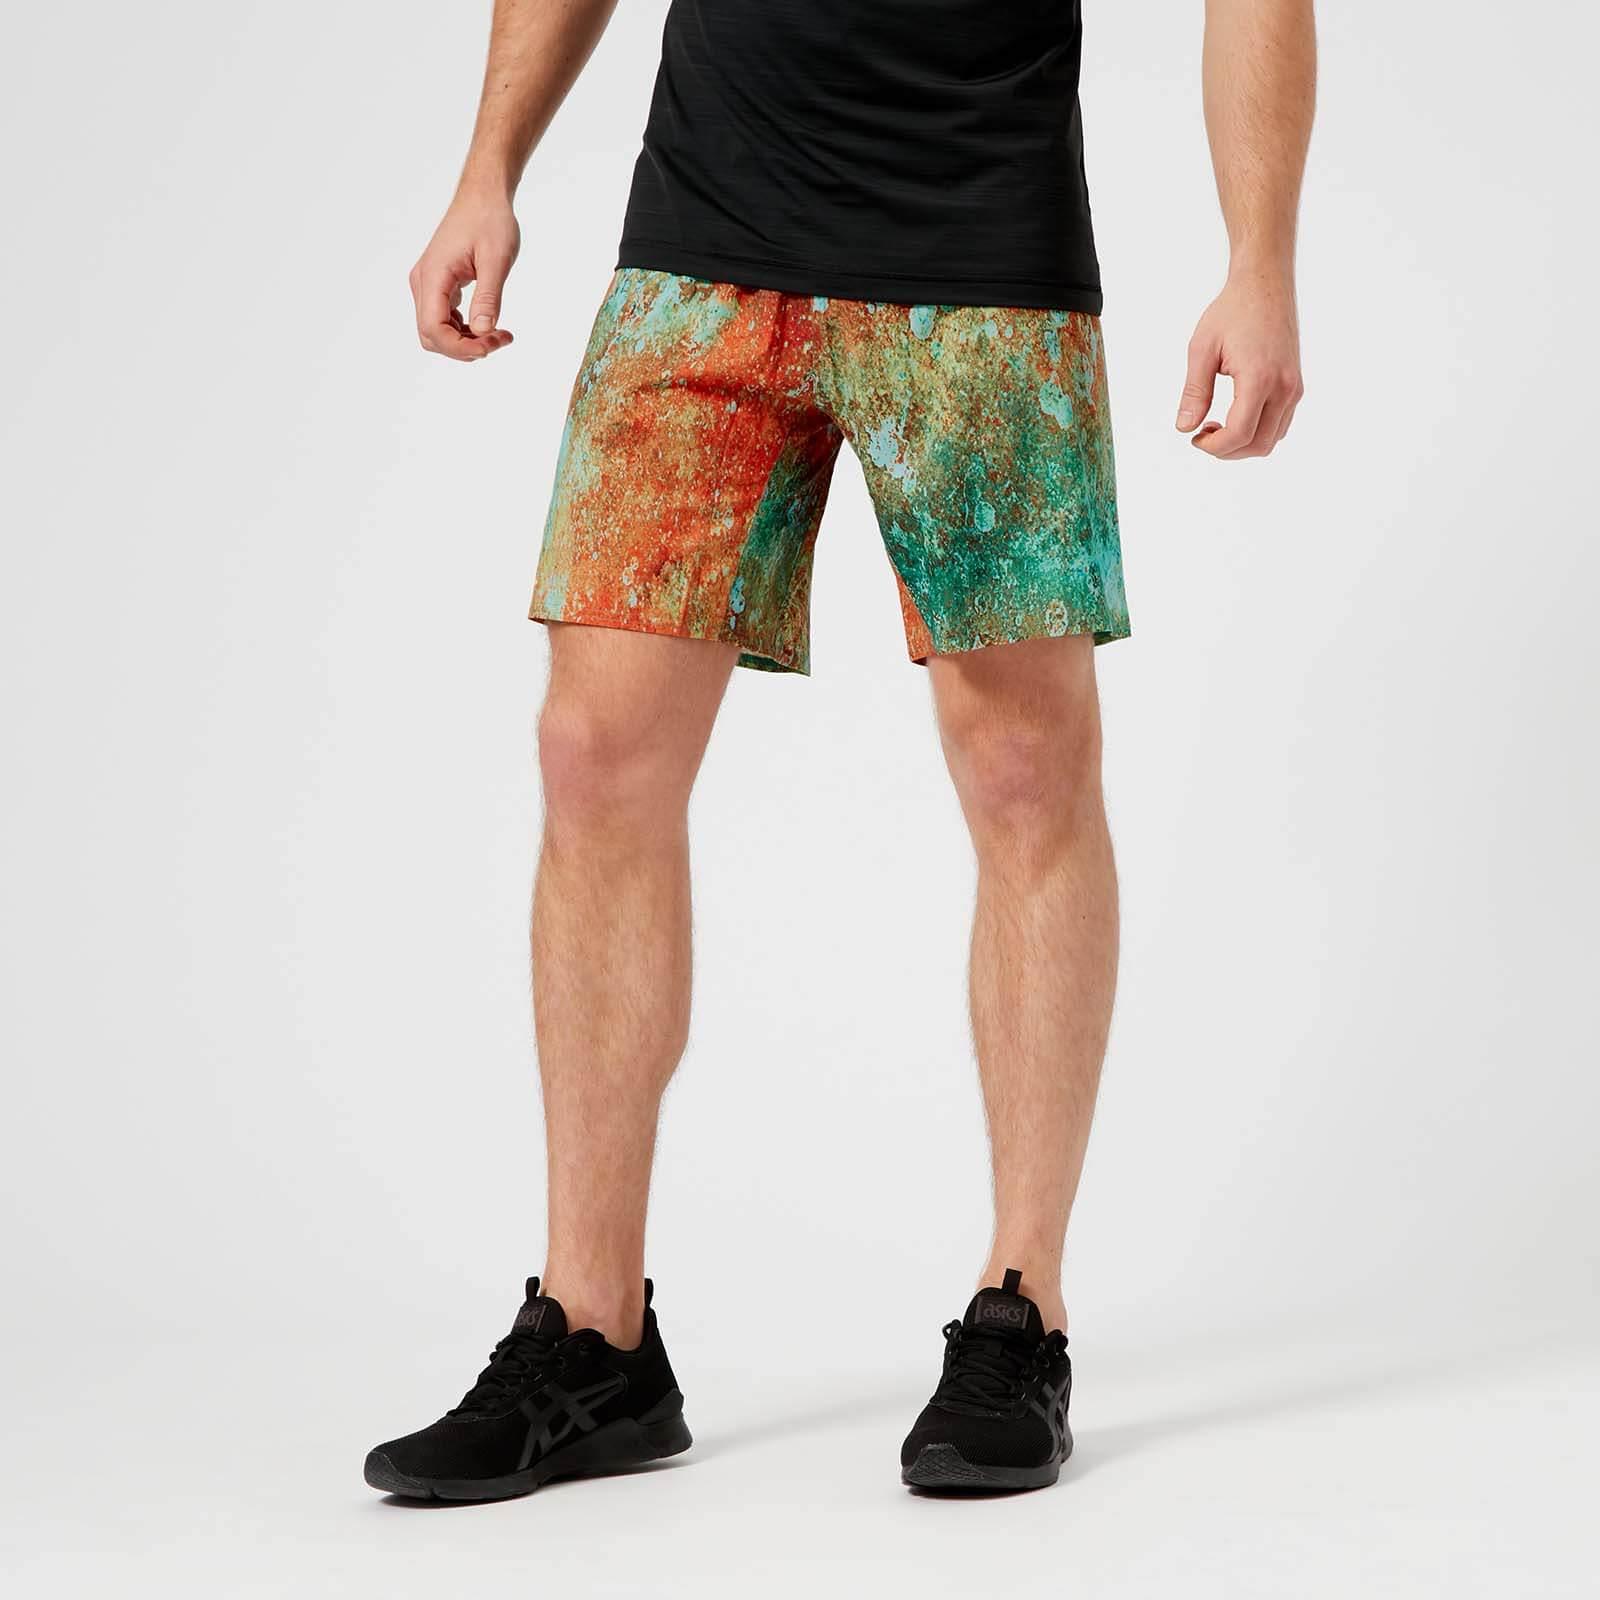 60c4bcfe6dc3 Reebok Men s CrossFit Speed Shorts - Turquoise Sports   Leisure ...